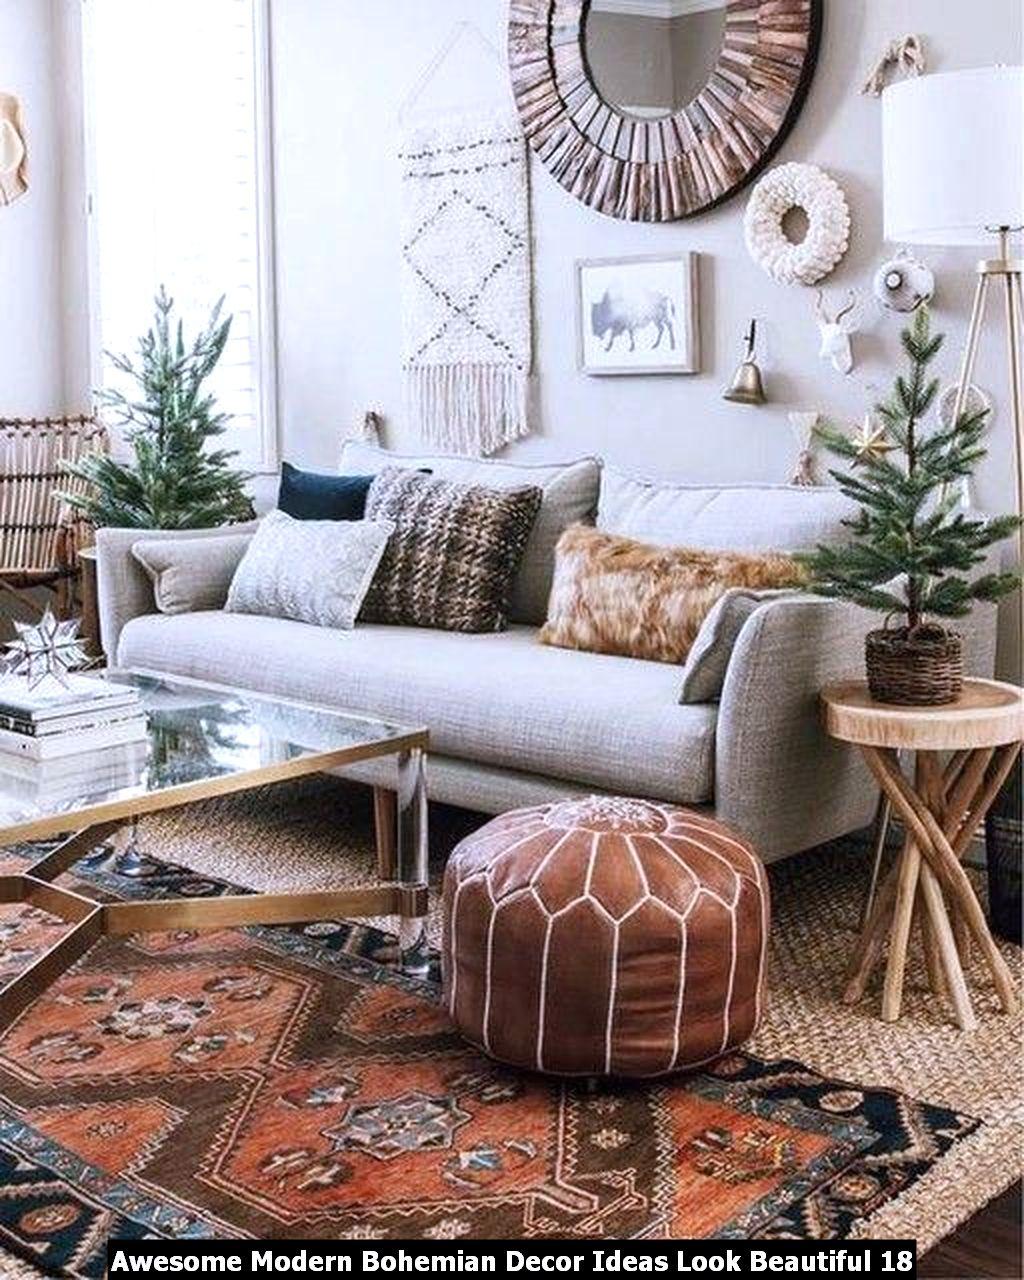 Awesome Modern Bohemian Decor Ideas Look Beautiful 18